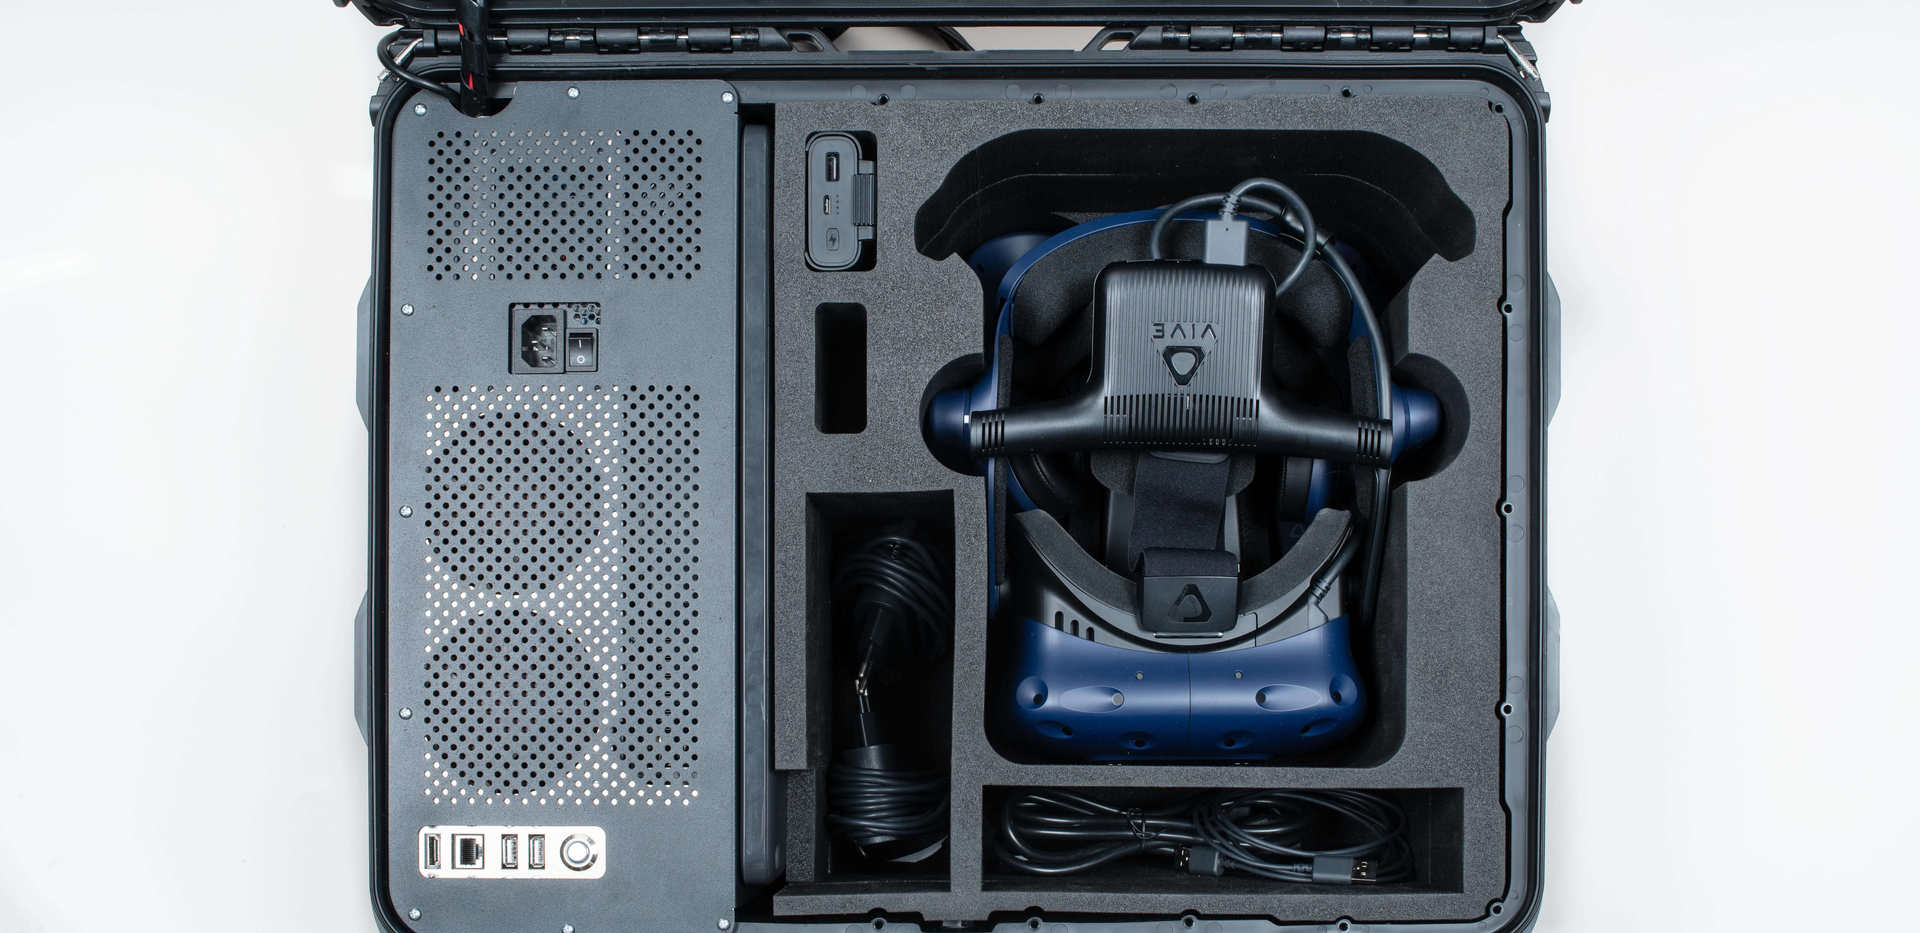 Shift_HTC_dessus-compressor (1).jpg